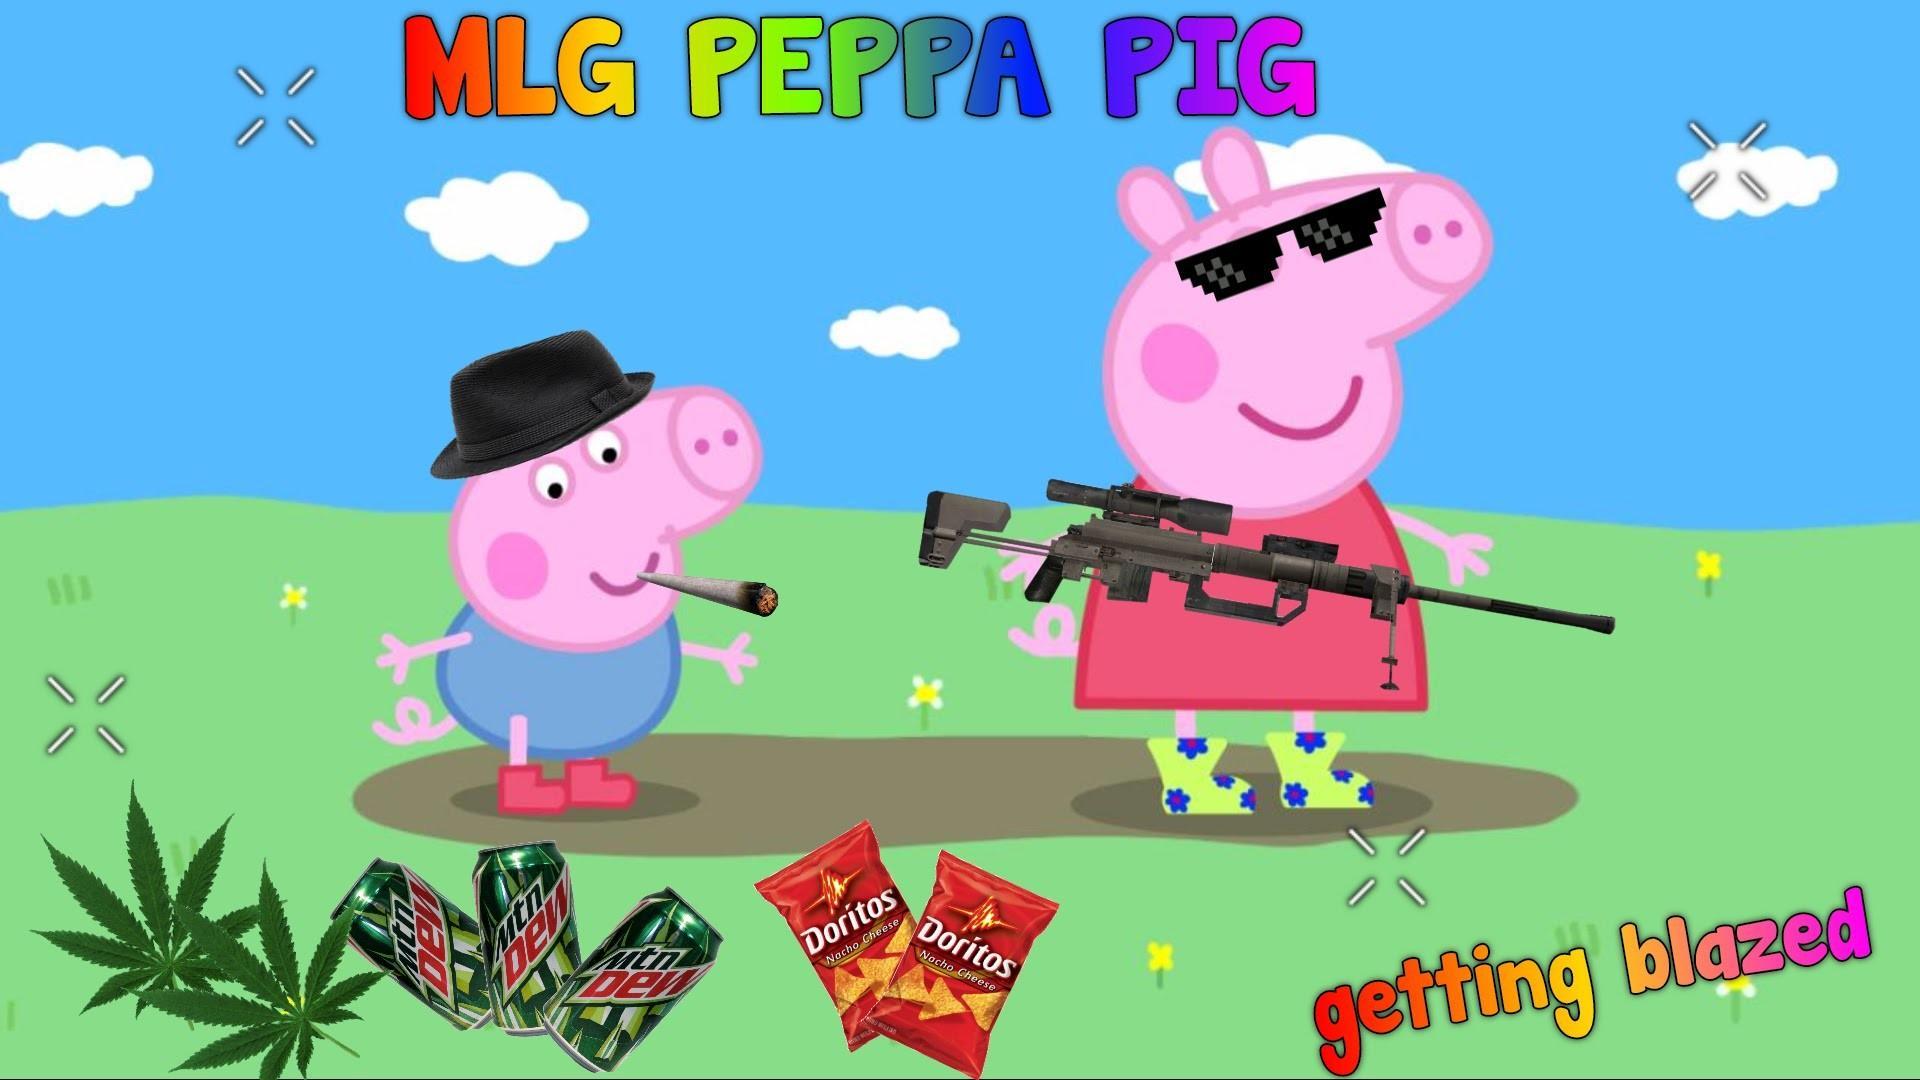 Peppa Pig Supreme Wallpapers - Wallpaper Cave